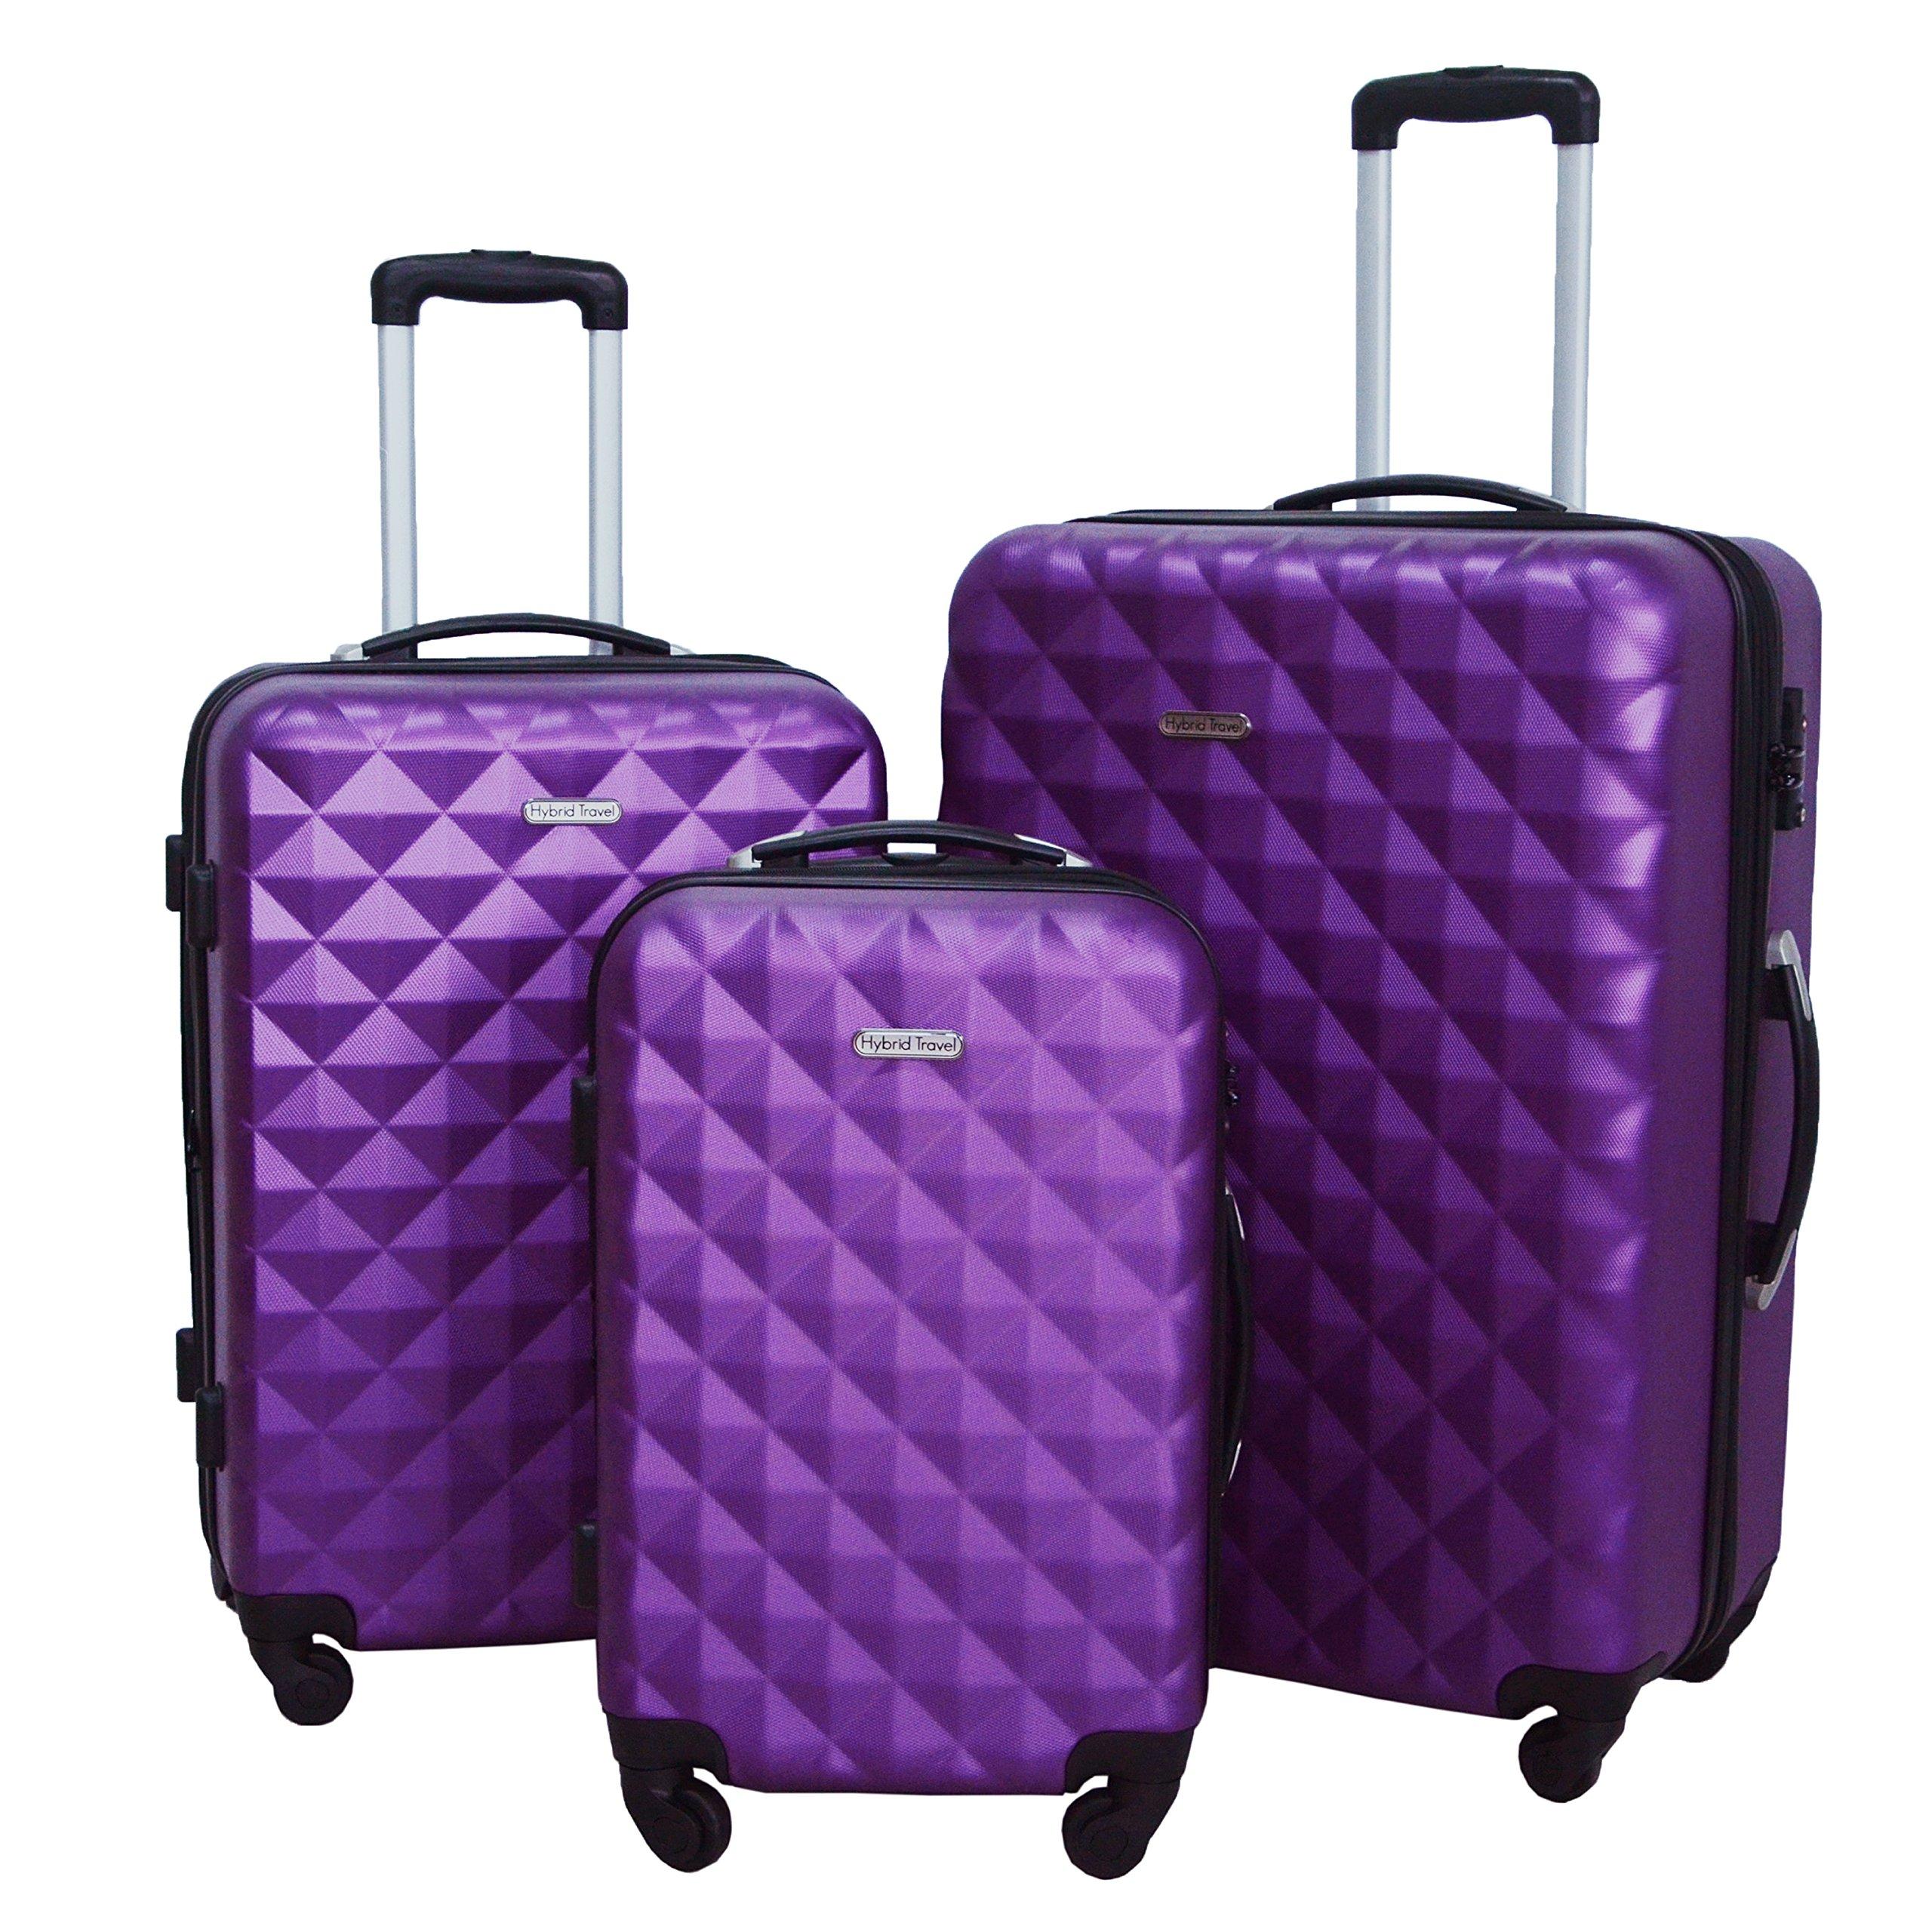 3 Piece Luggage Set Durable Lightweight Hard Case Spinner Suitecase LUG3 SS577A PURPLE PURPLE by HyBrid Travel